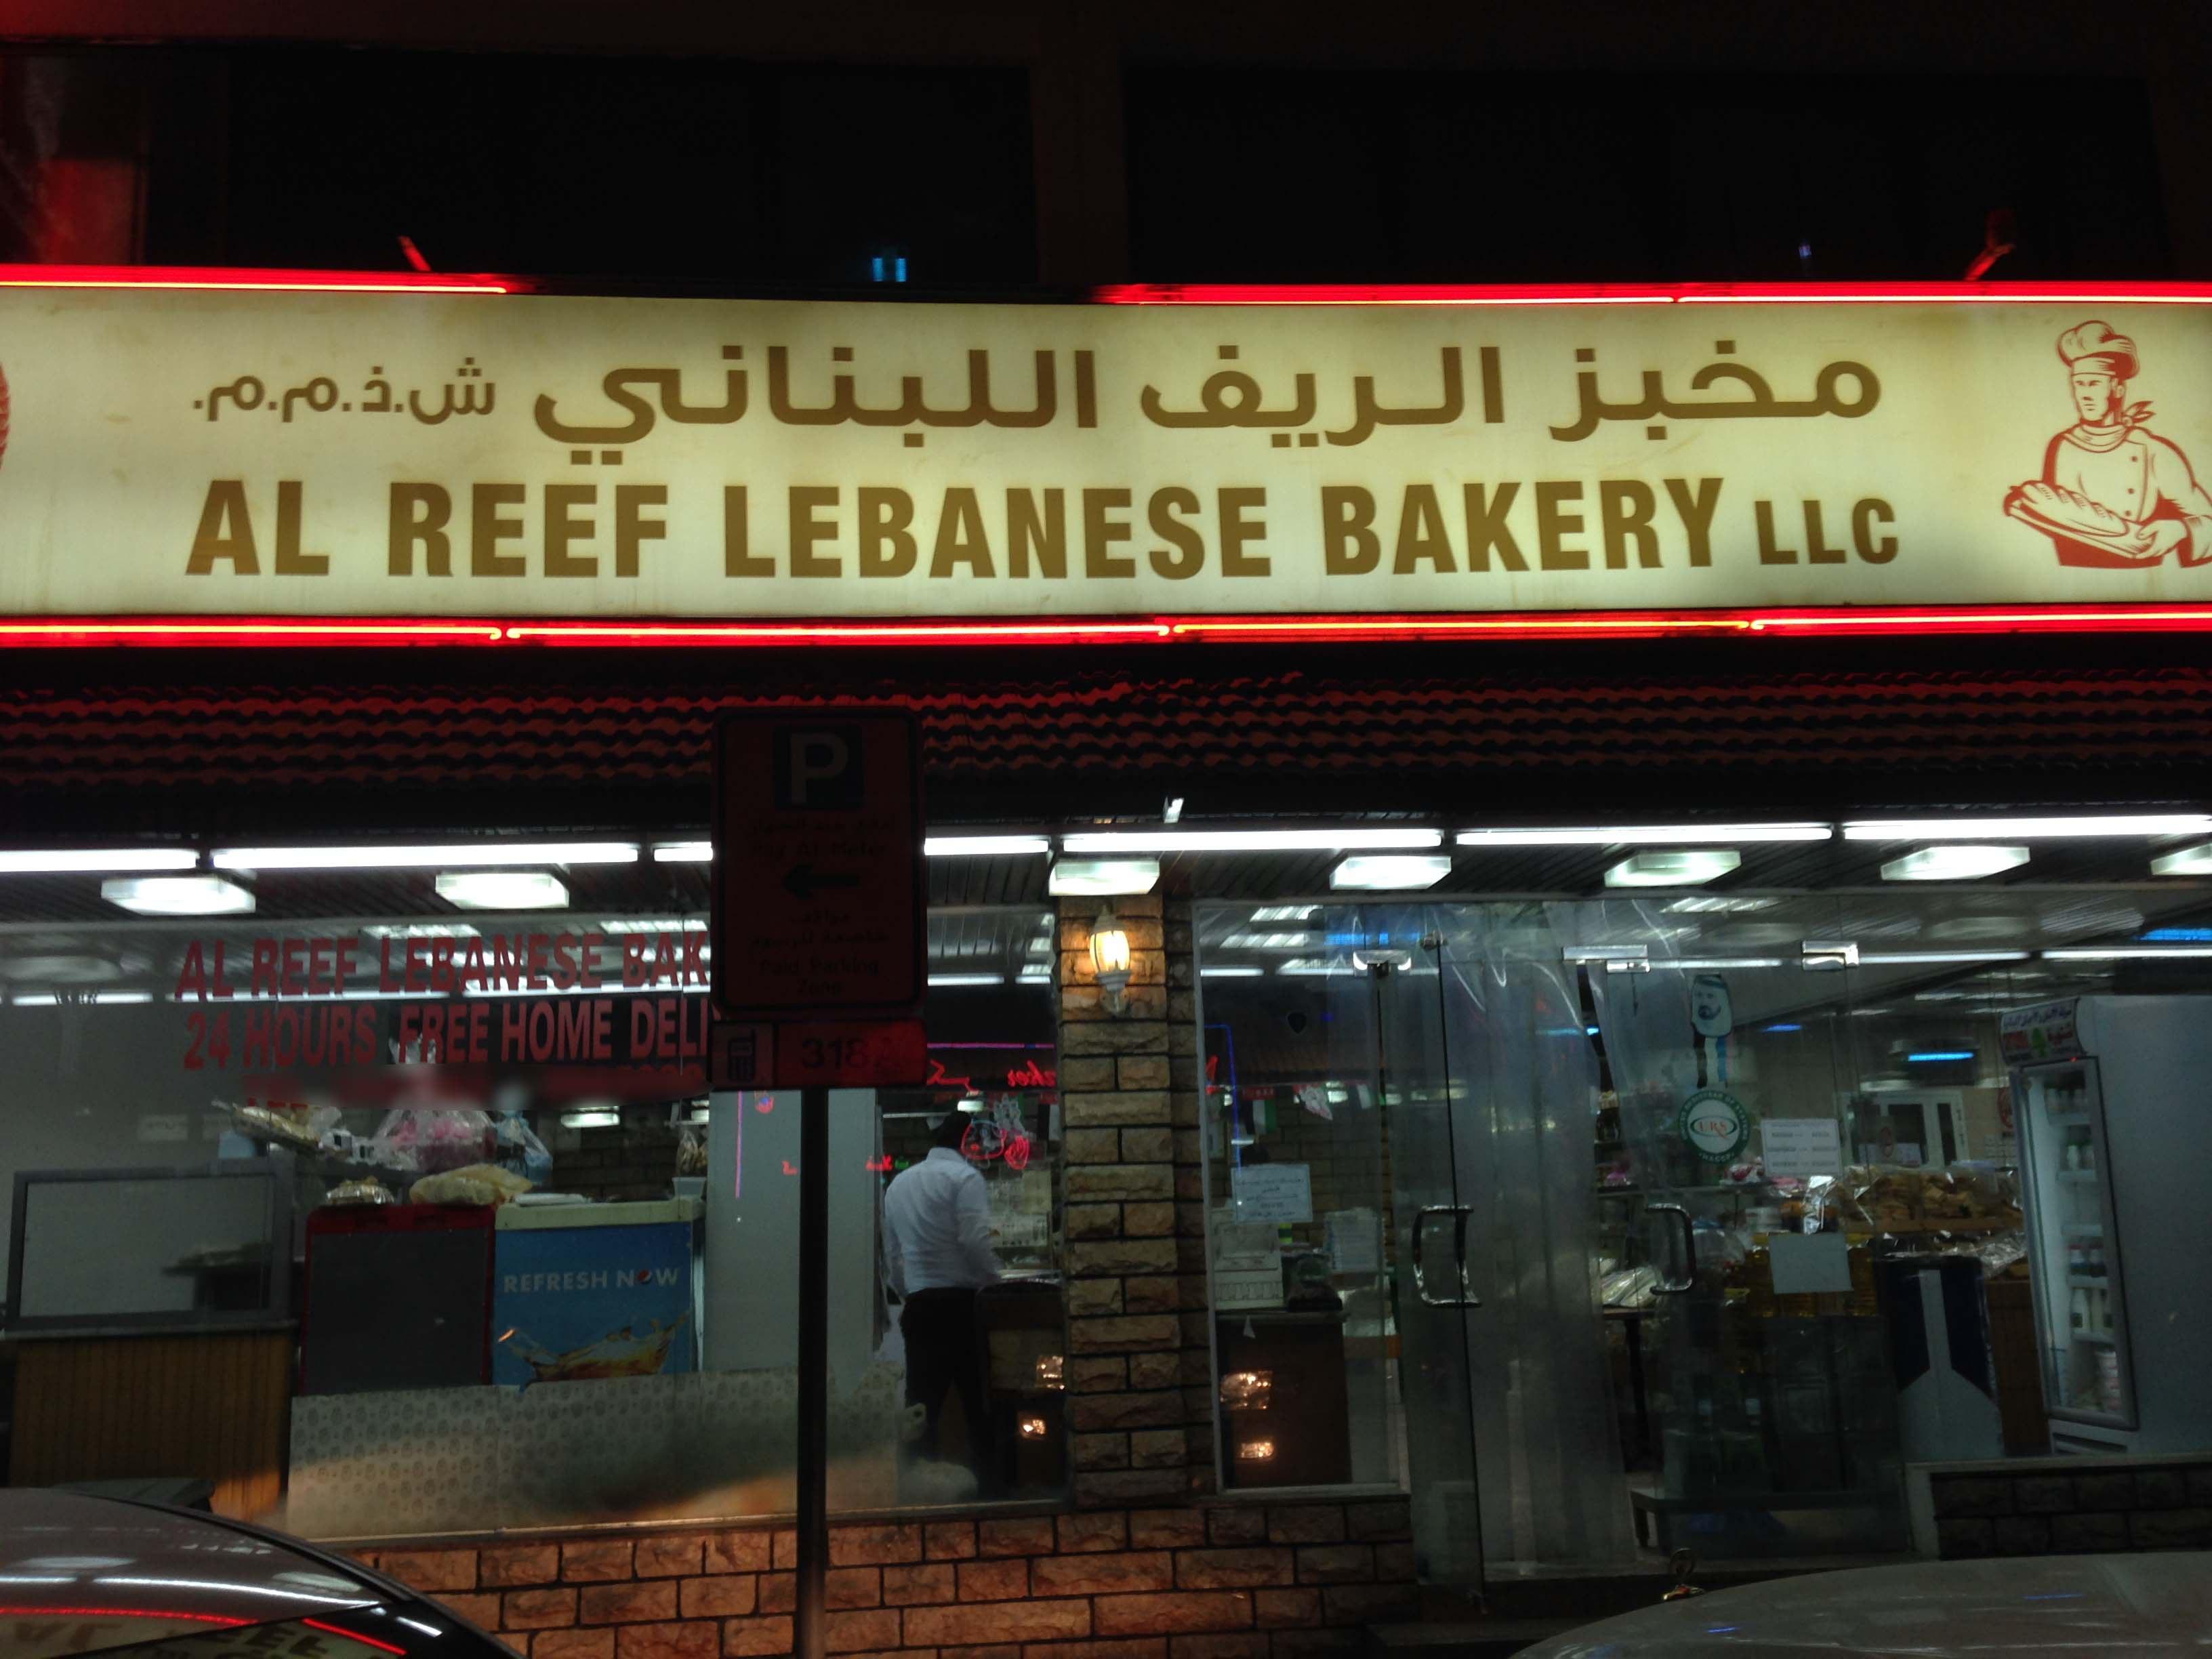 Al Reef Lebanese Bakery